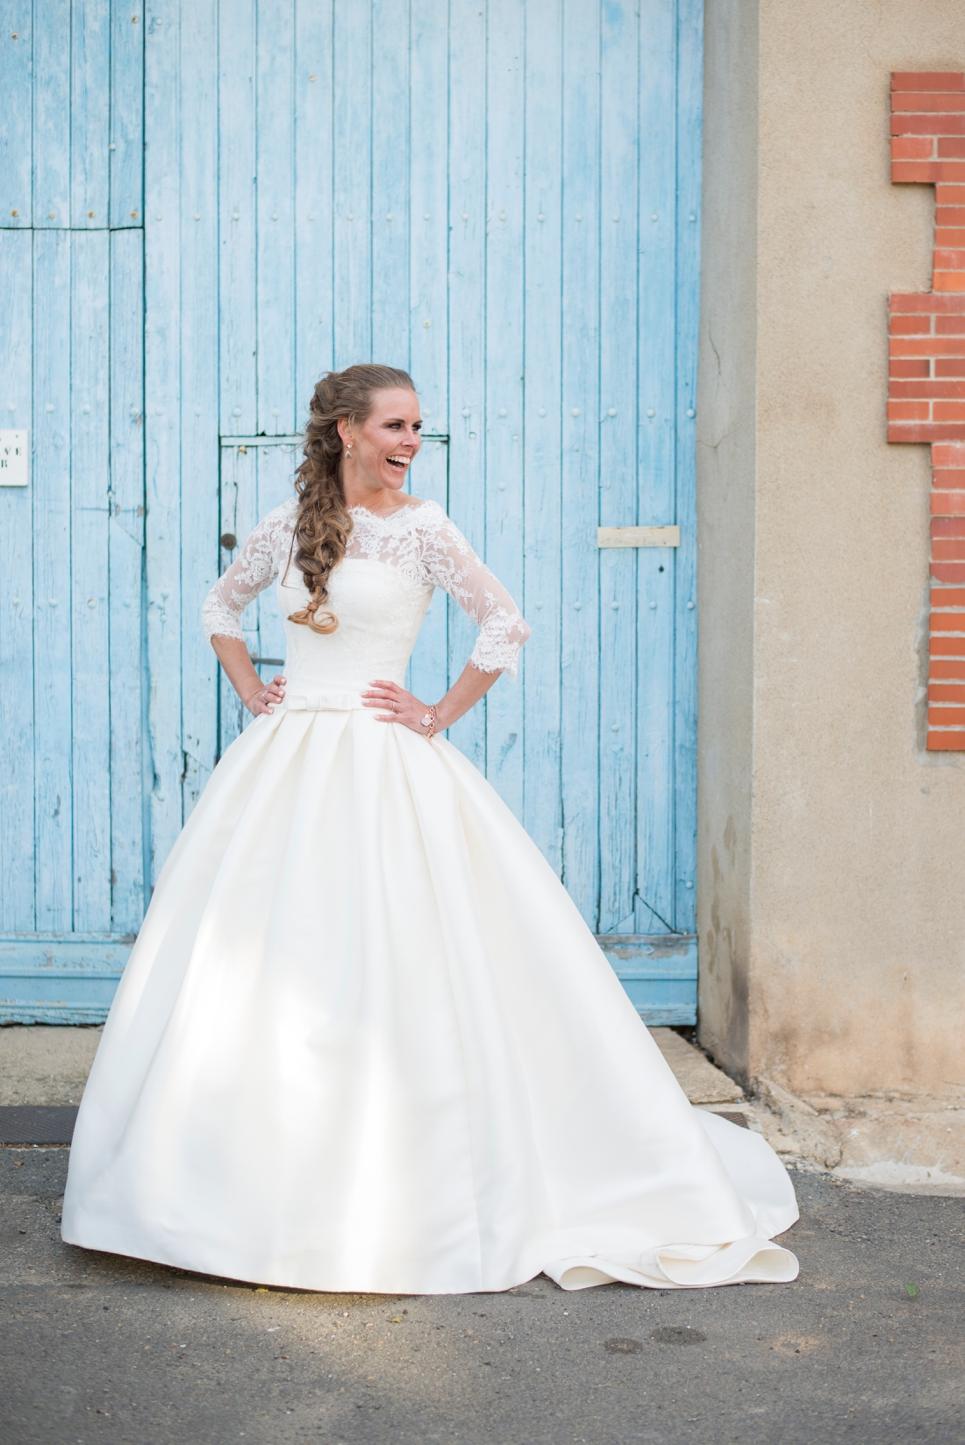 bruid-karakteristiek-dorpje-zuid-frankrijk-blomac